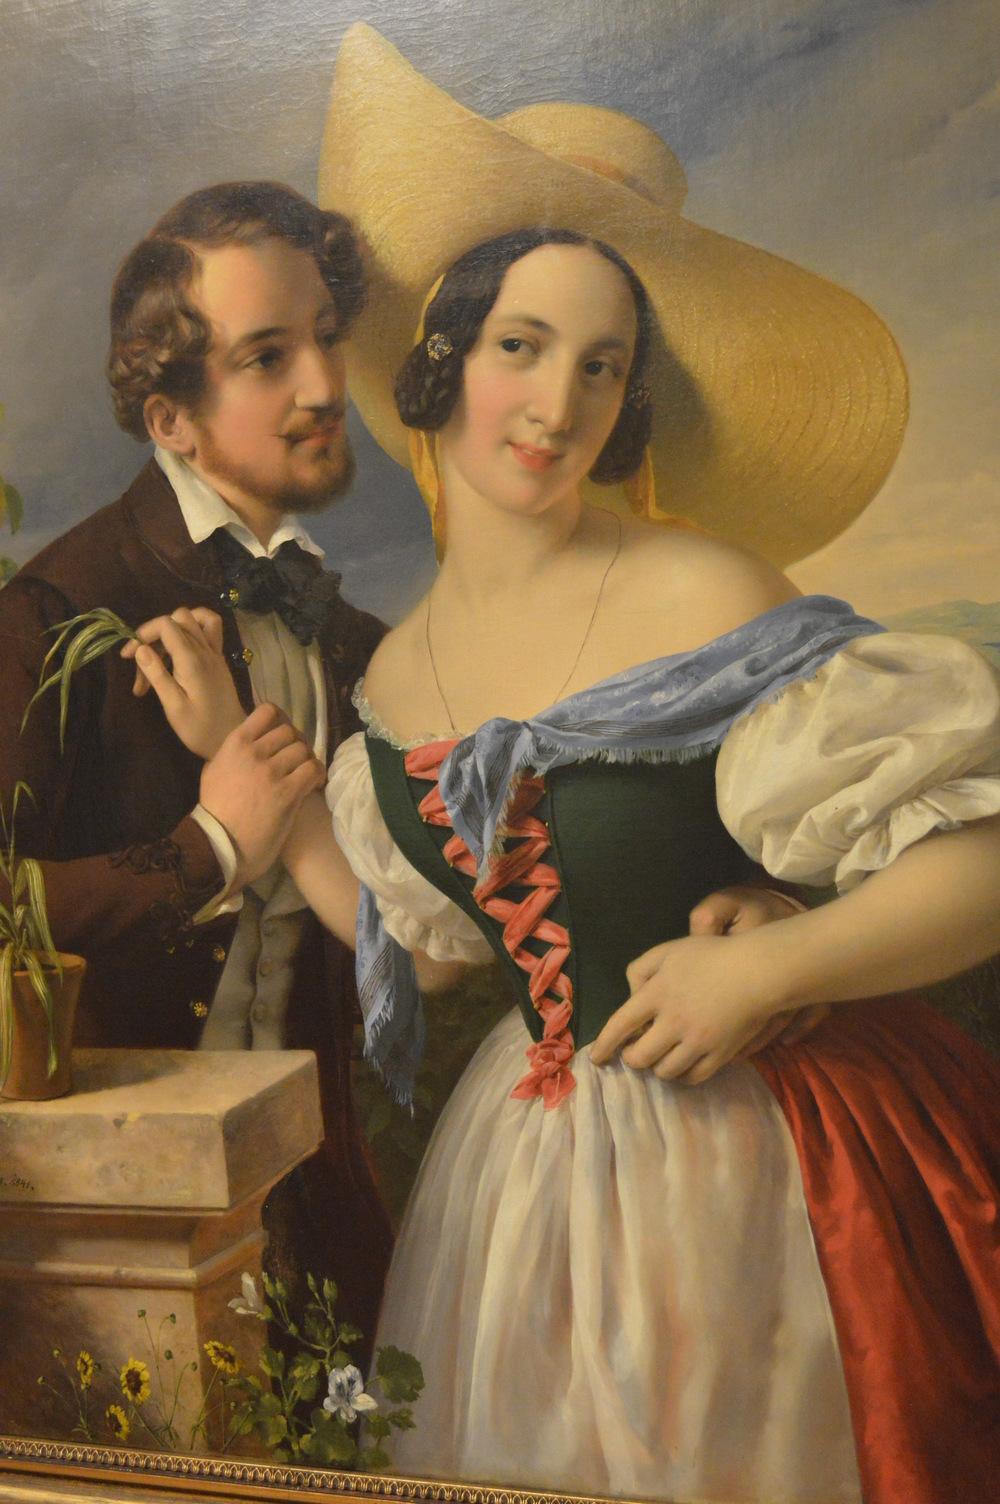 Hungarian National Gallery - Flirting